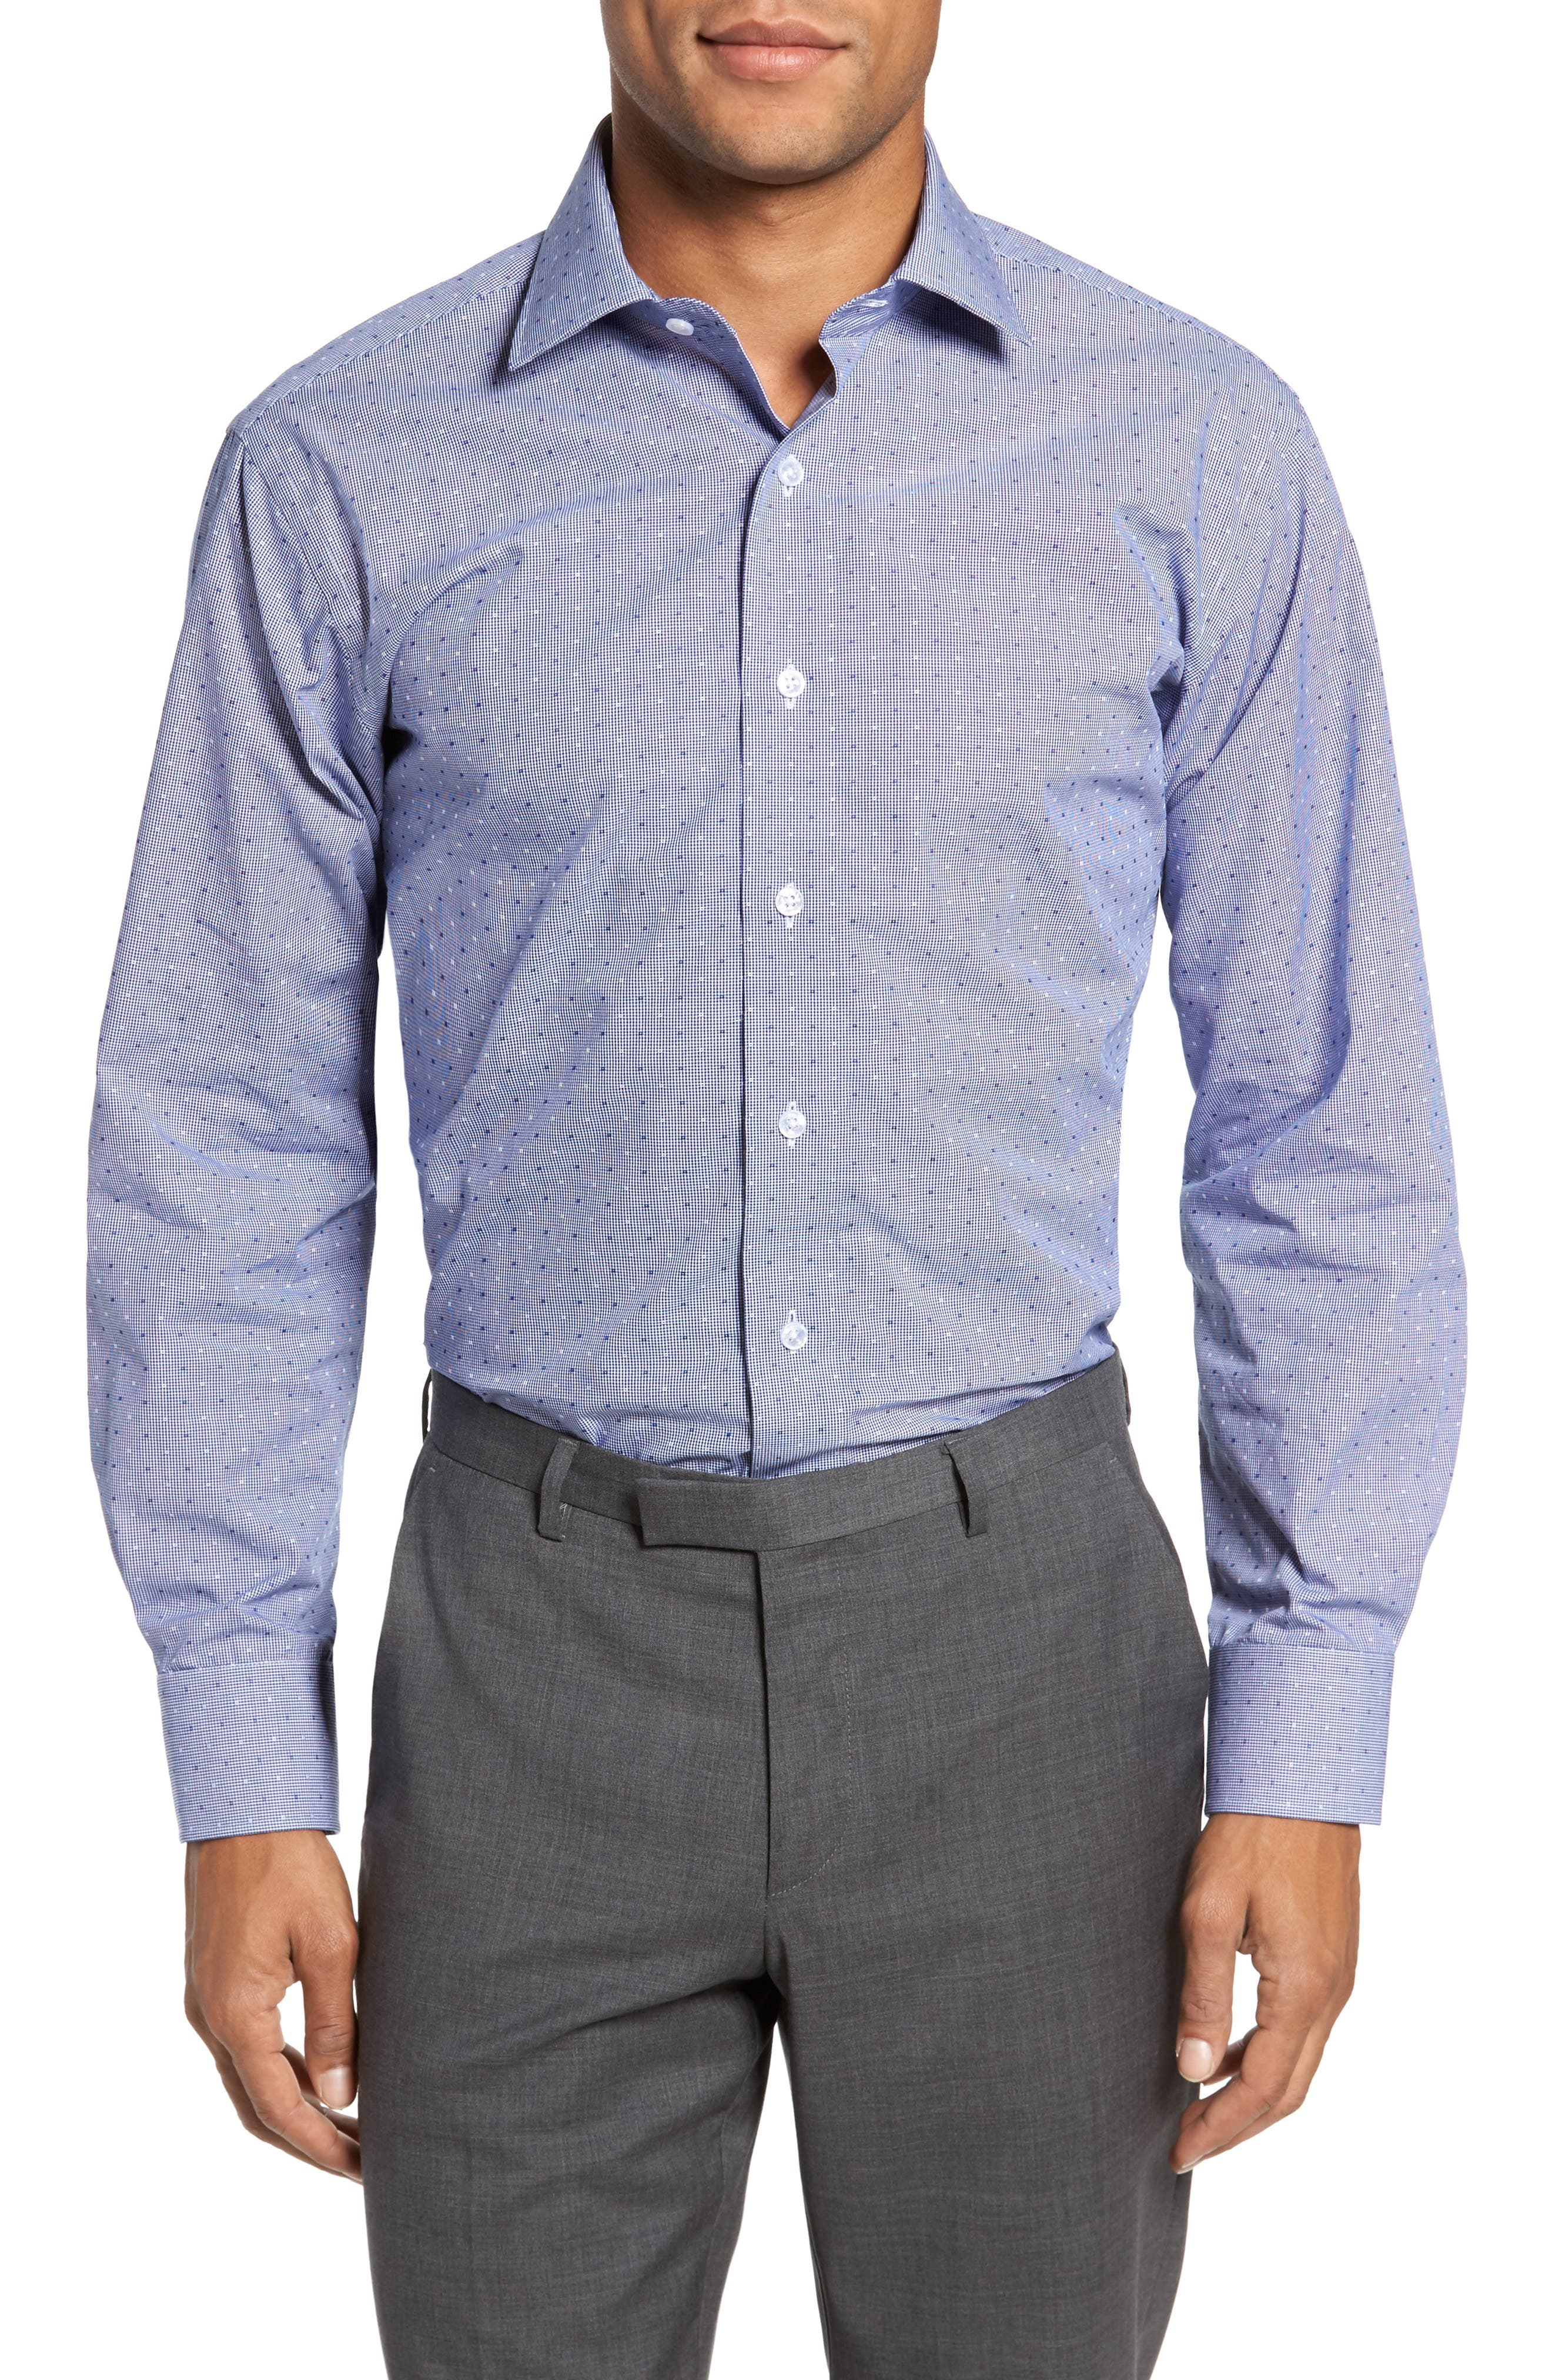 LORENZO UOMO, Trim Fit Check Dress Shirt, Main thumbnail 1, color, NAVY